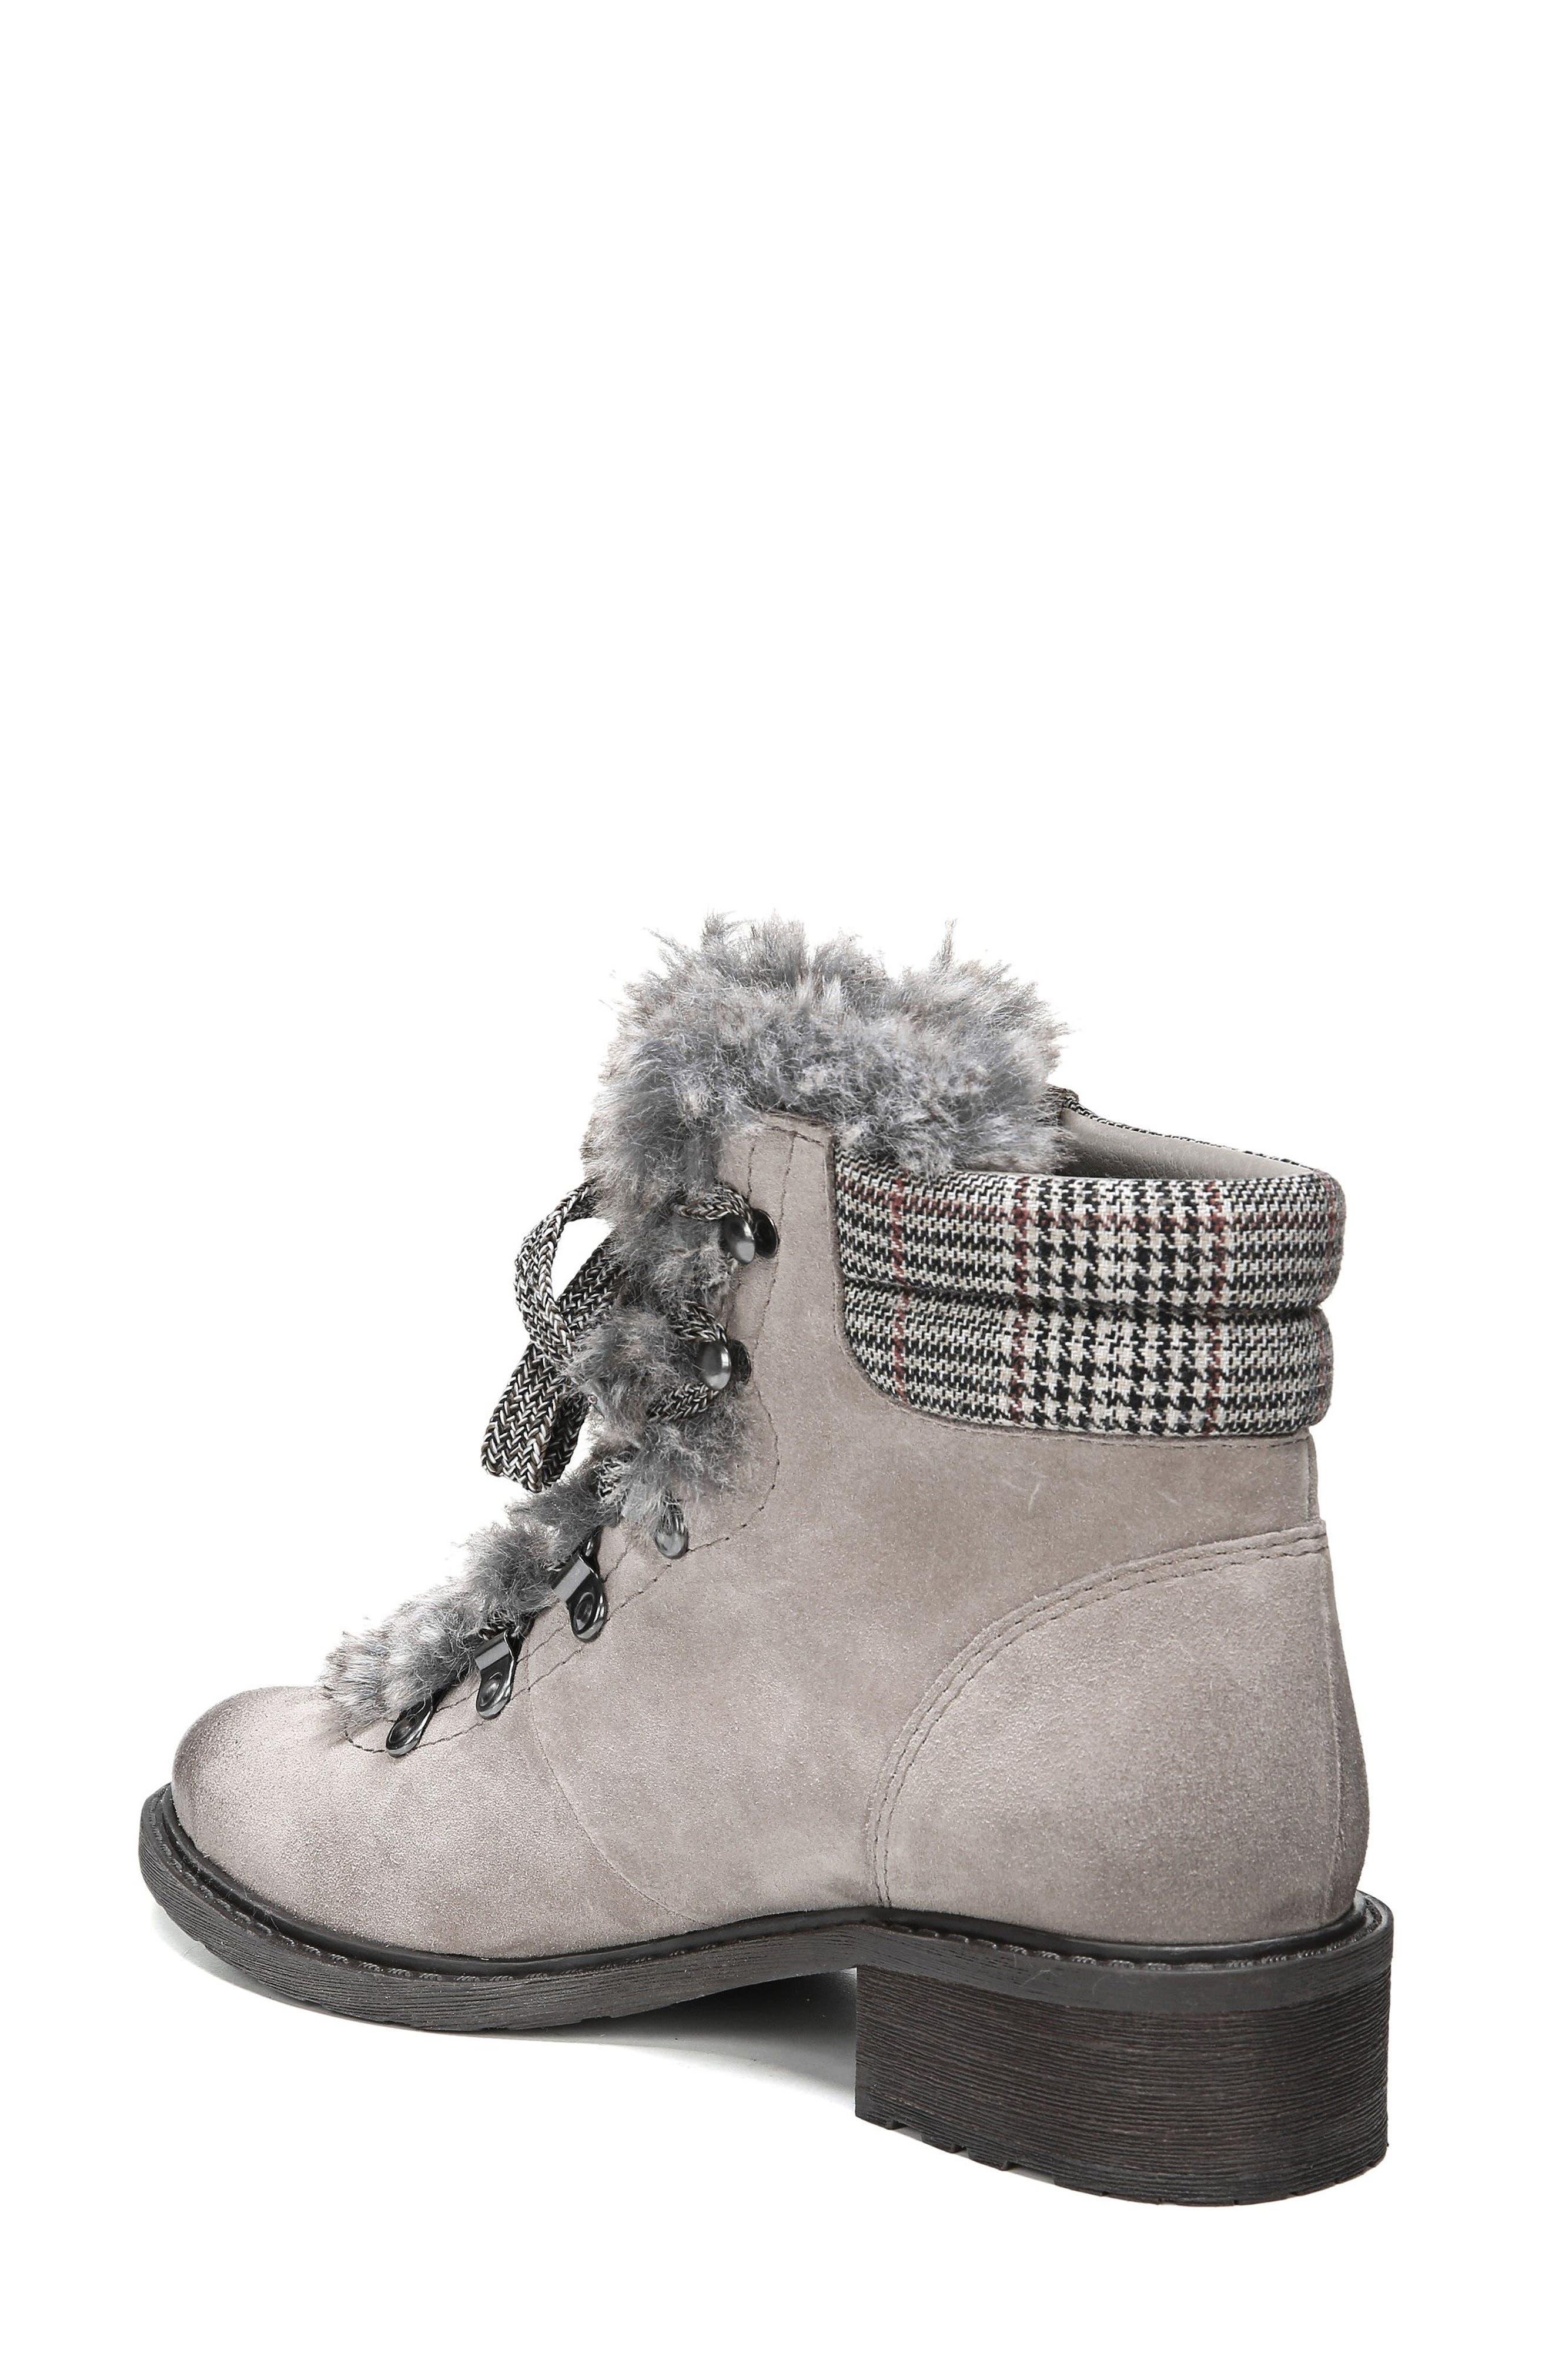 Darrah 2 Faux Fur Trim Boot,                             Alternate thumbnail 2, color,                             021